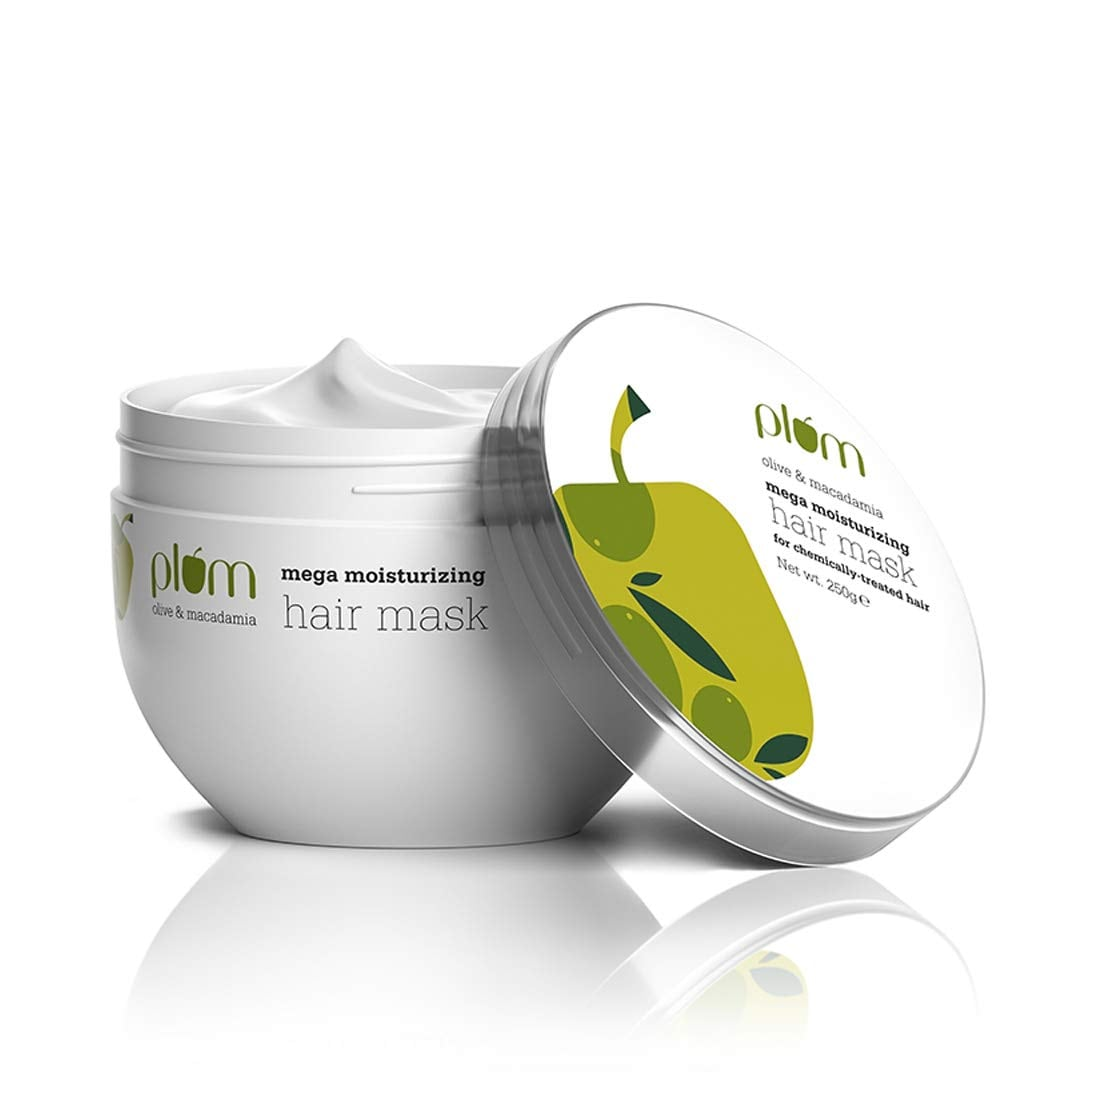 Plum Olive & Macadamia Mega Moisturizing Hair Mask (250 gm)